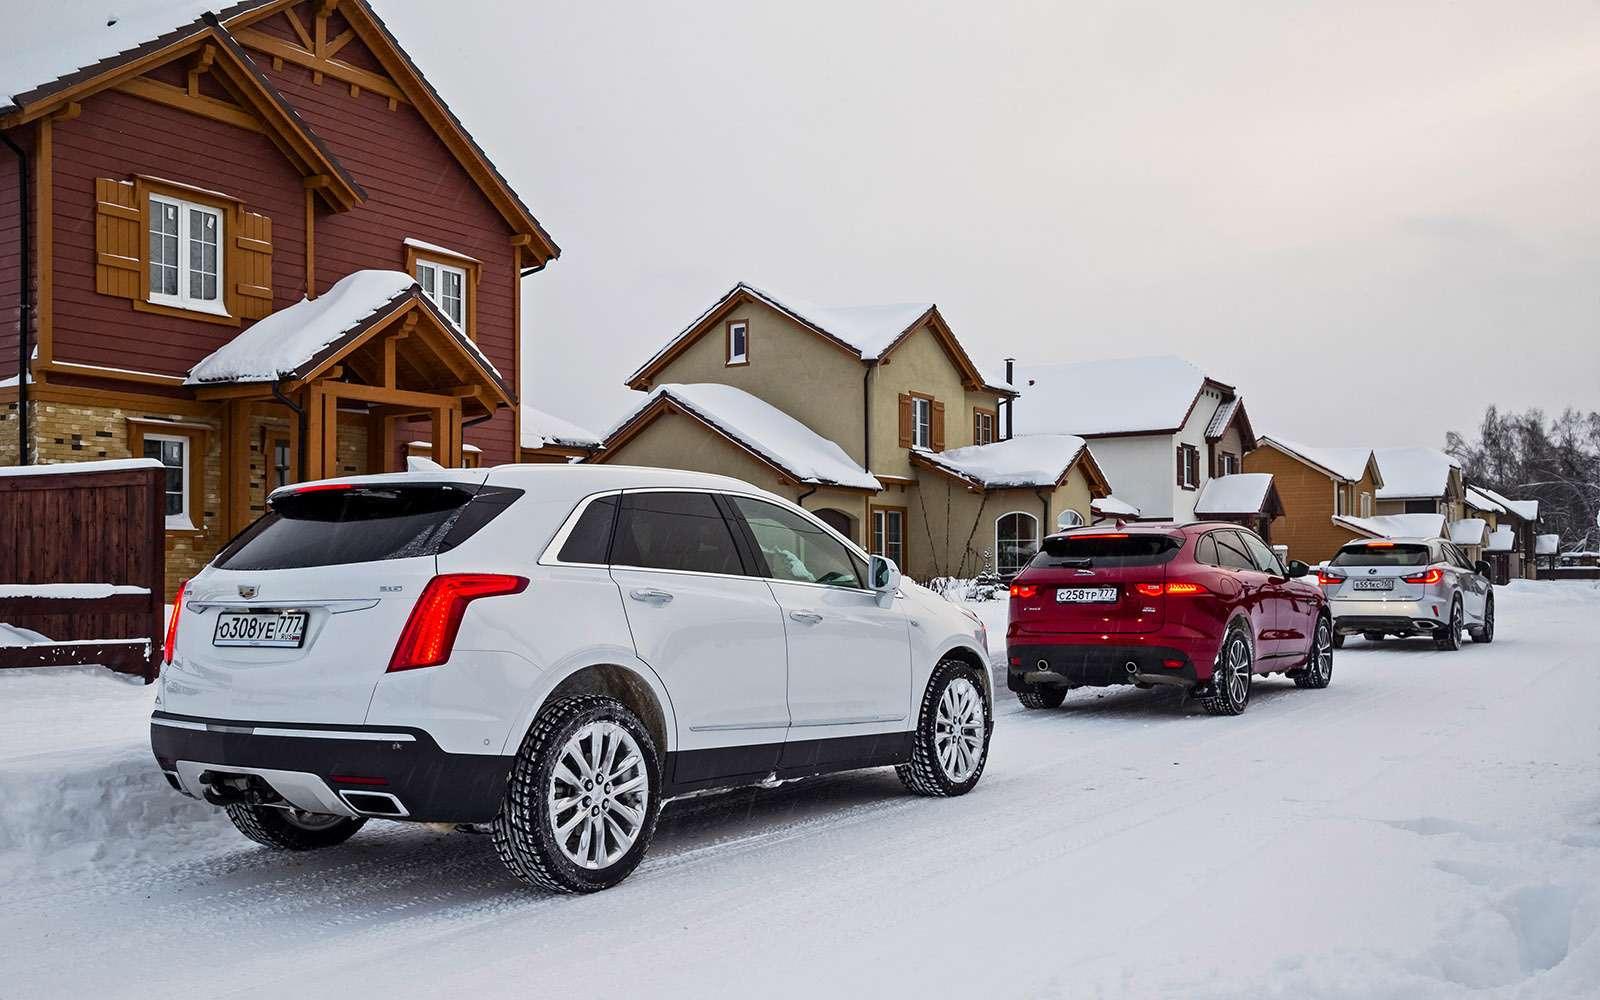 Тест премиум-кроссоверов: Lexus RX350, Cadillac XT5и Jaguar F-Pace— фото 721754